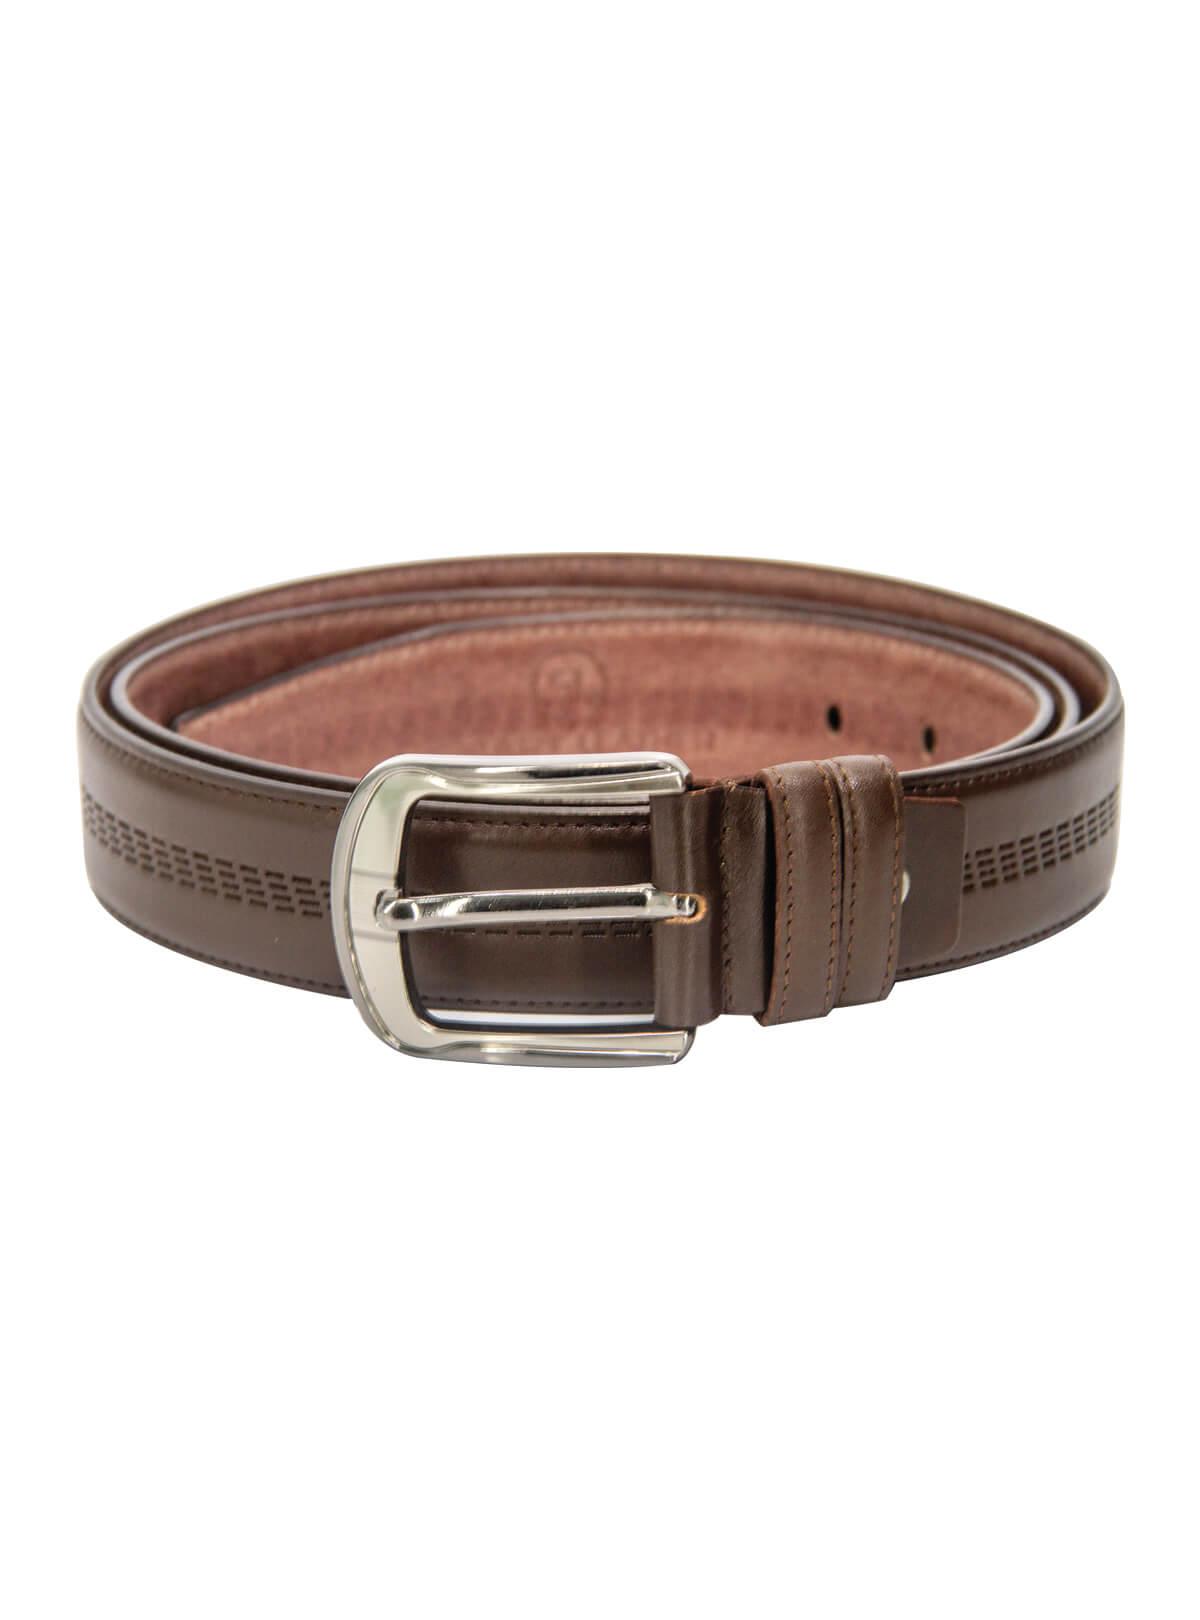 Dark Rum Leather Formal Belt For Men